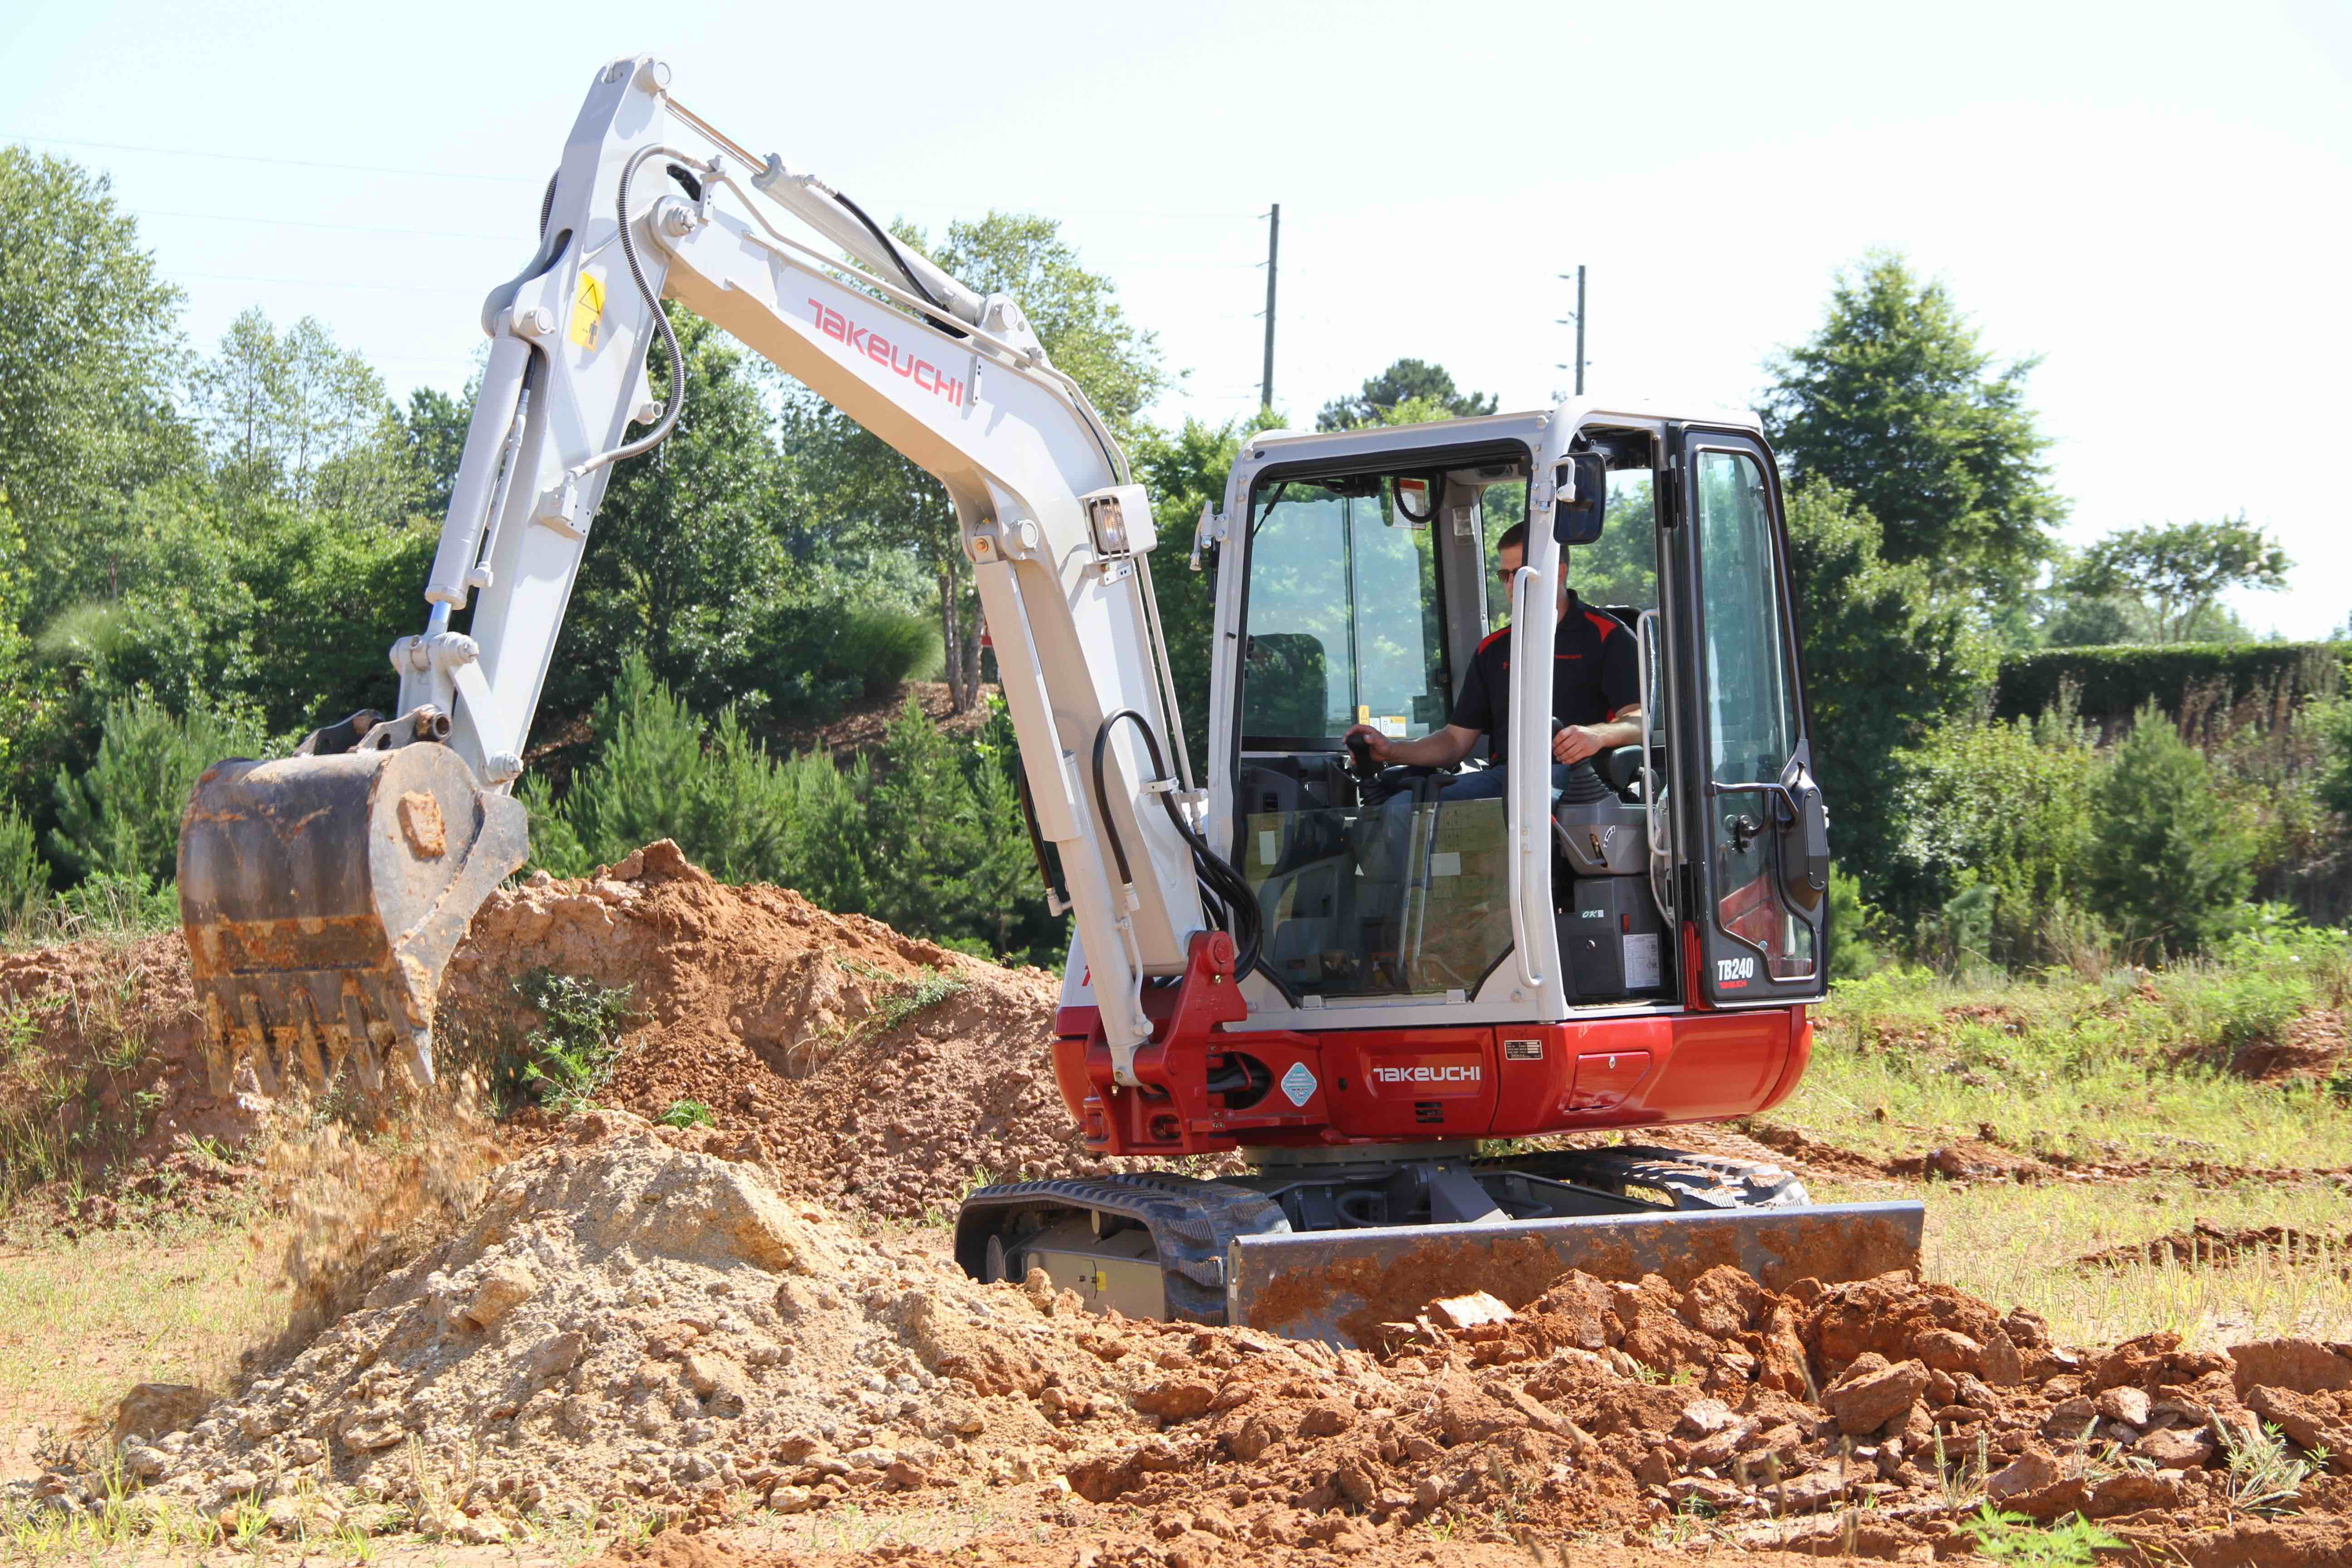 Takeuchi compact excavator